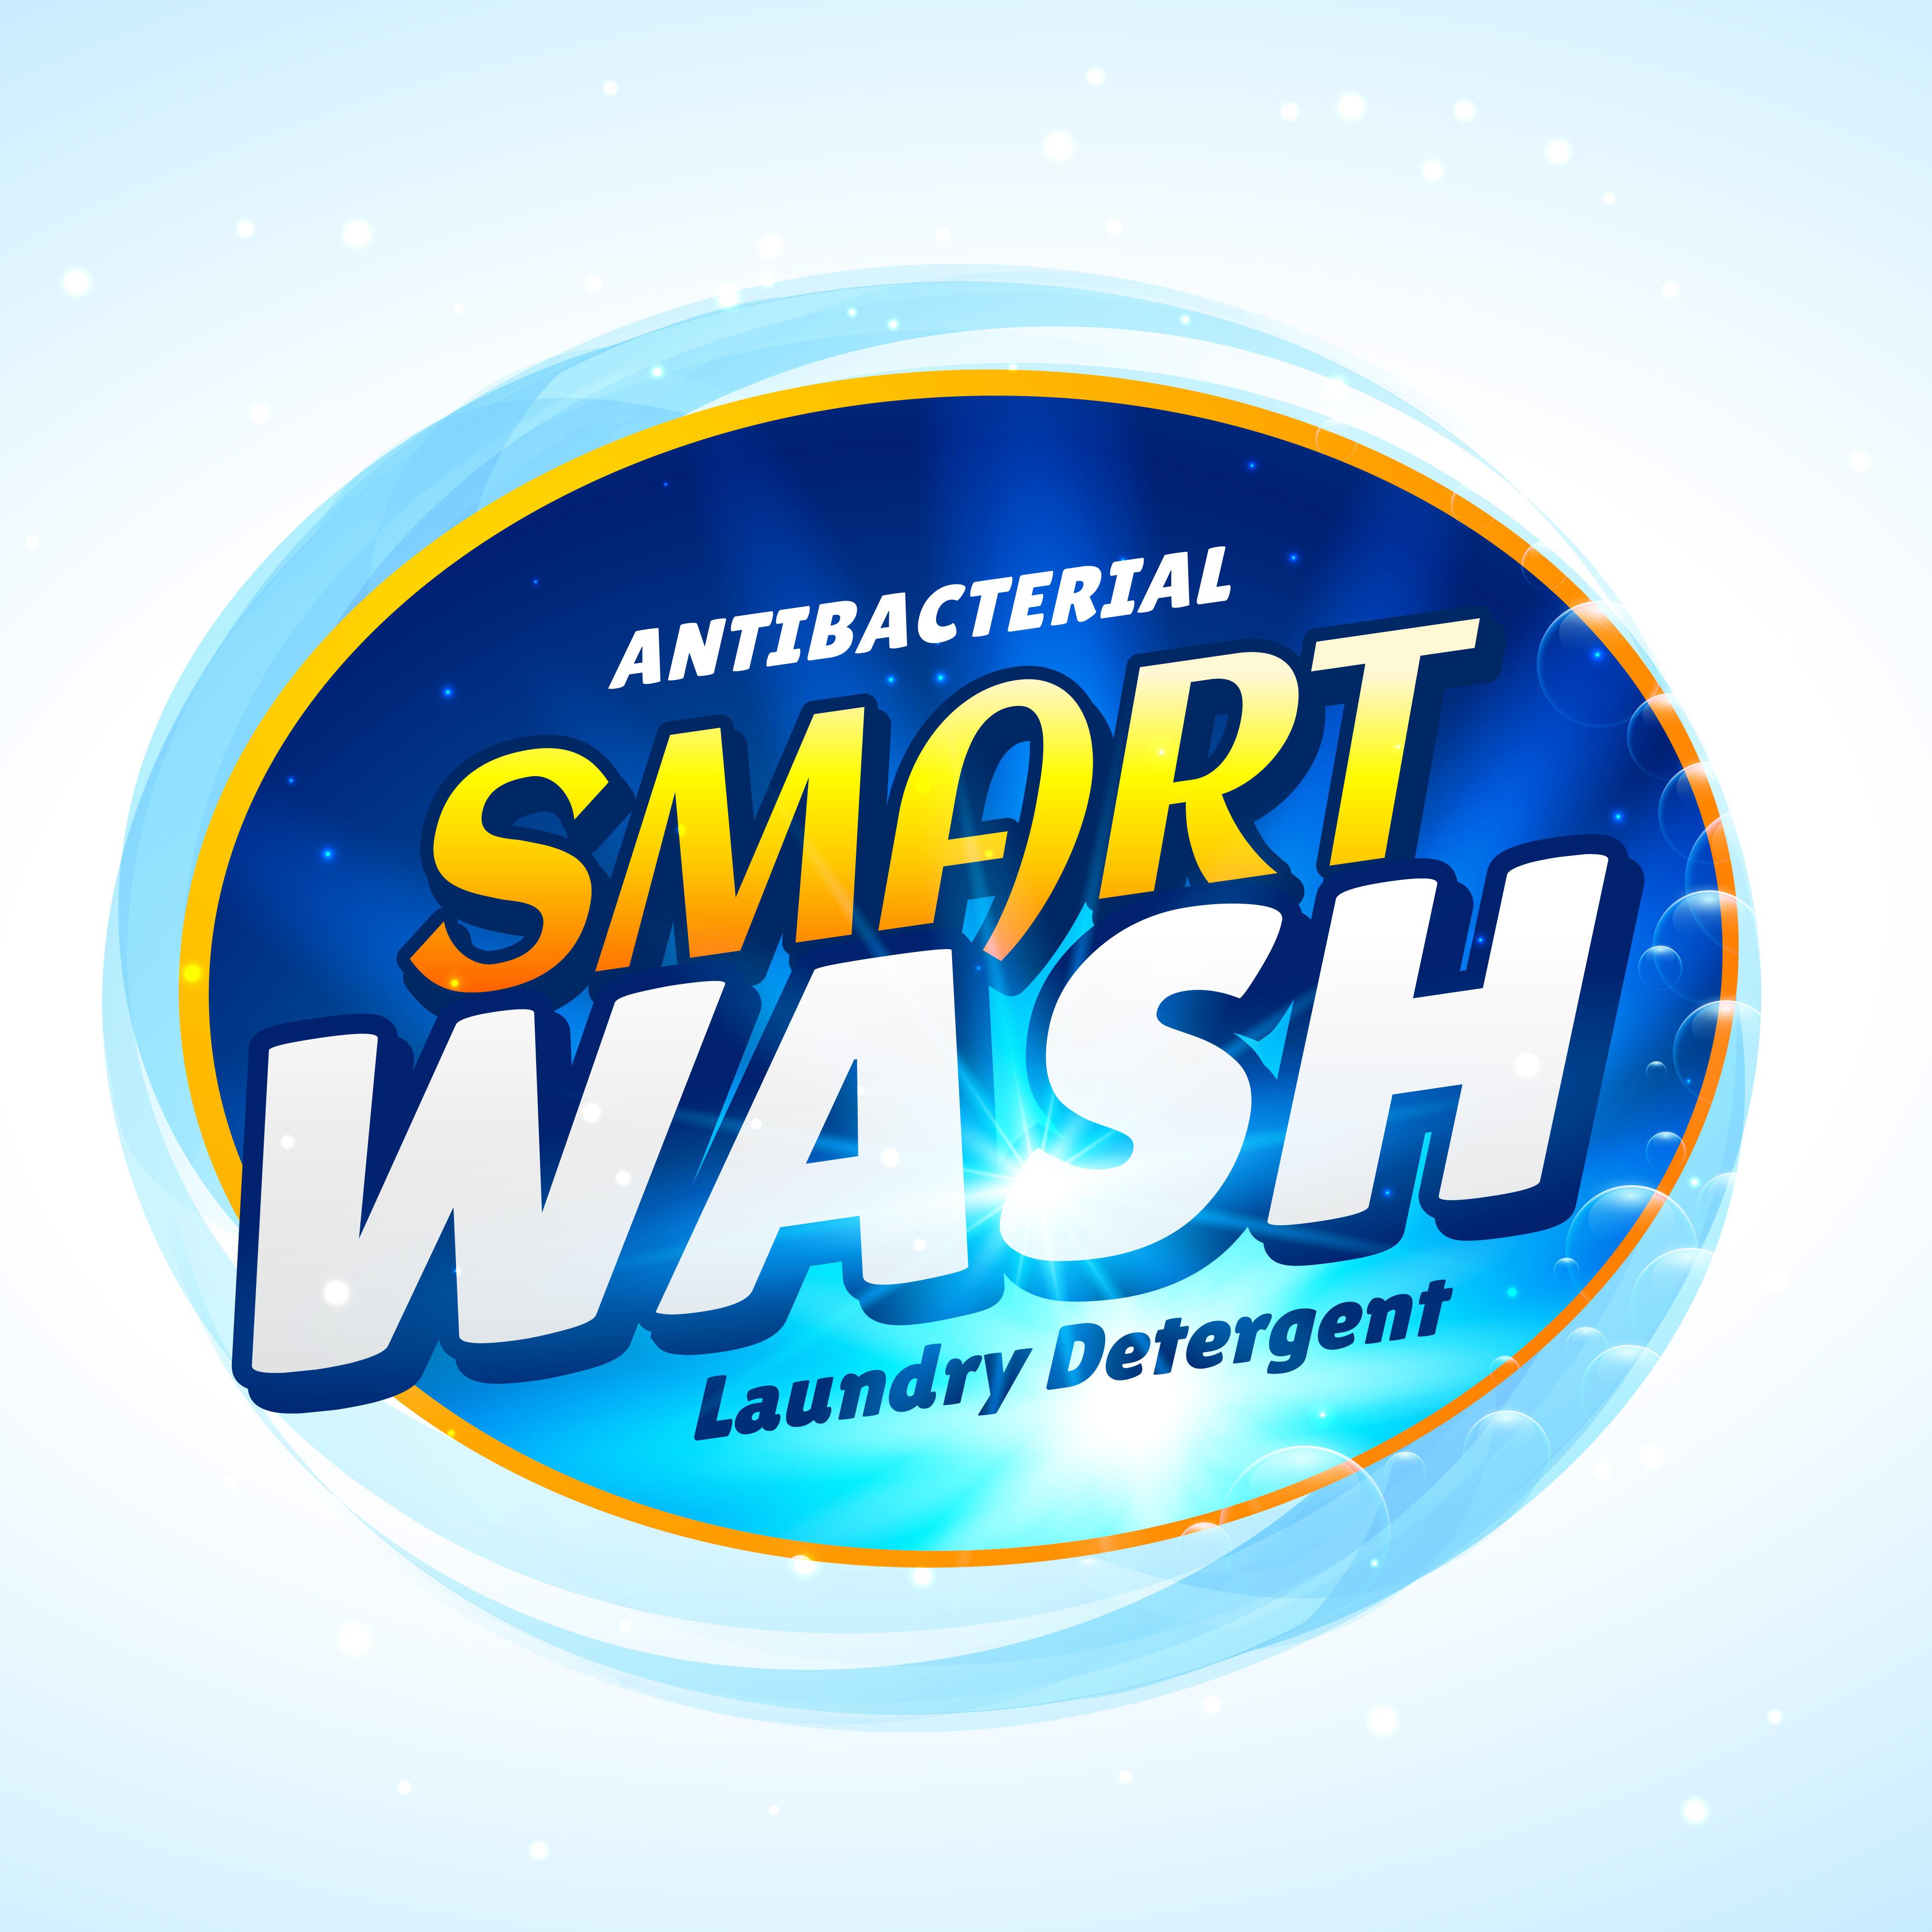 Detergent Free Vector Art 361 Free Downloads